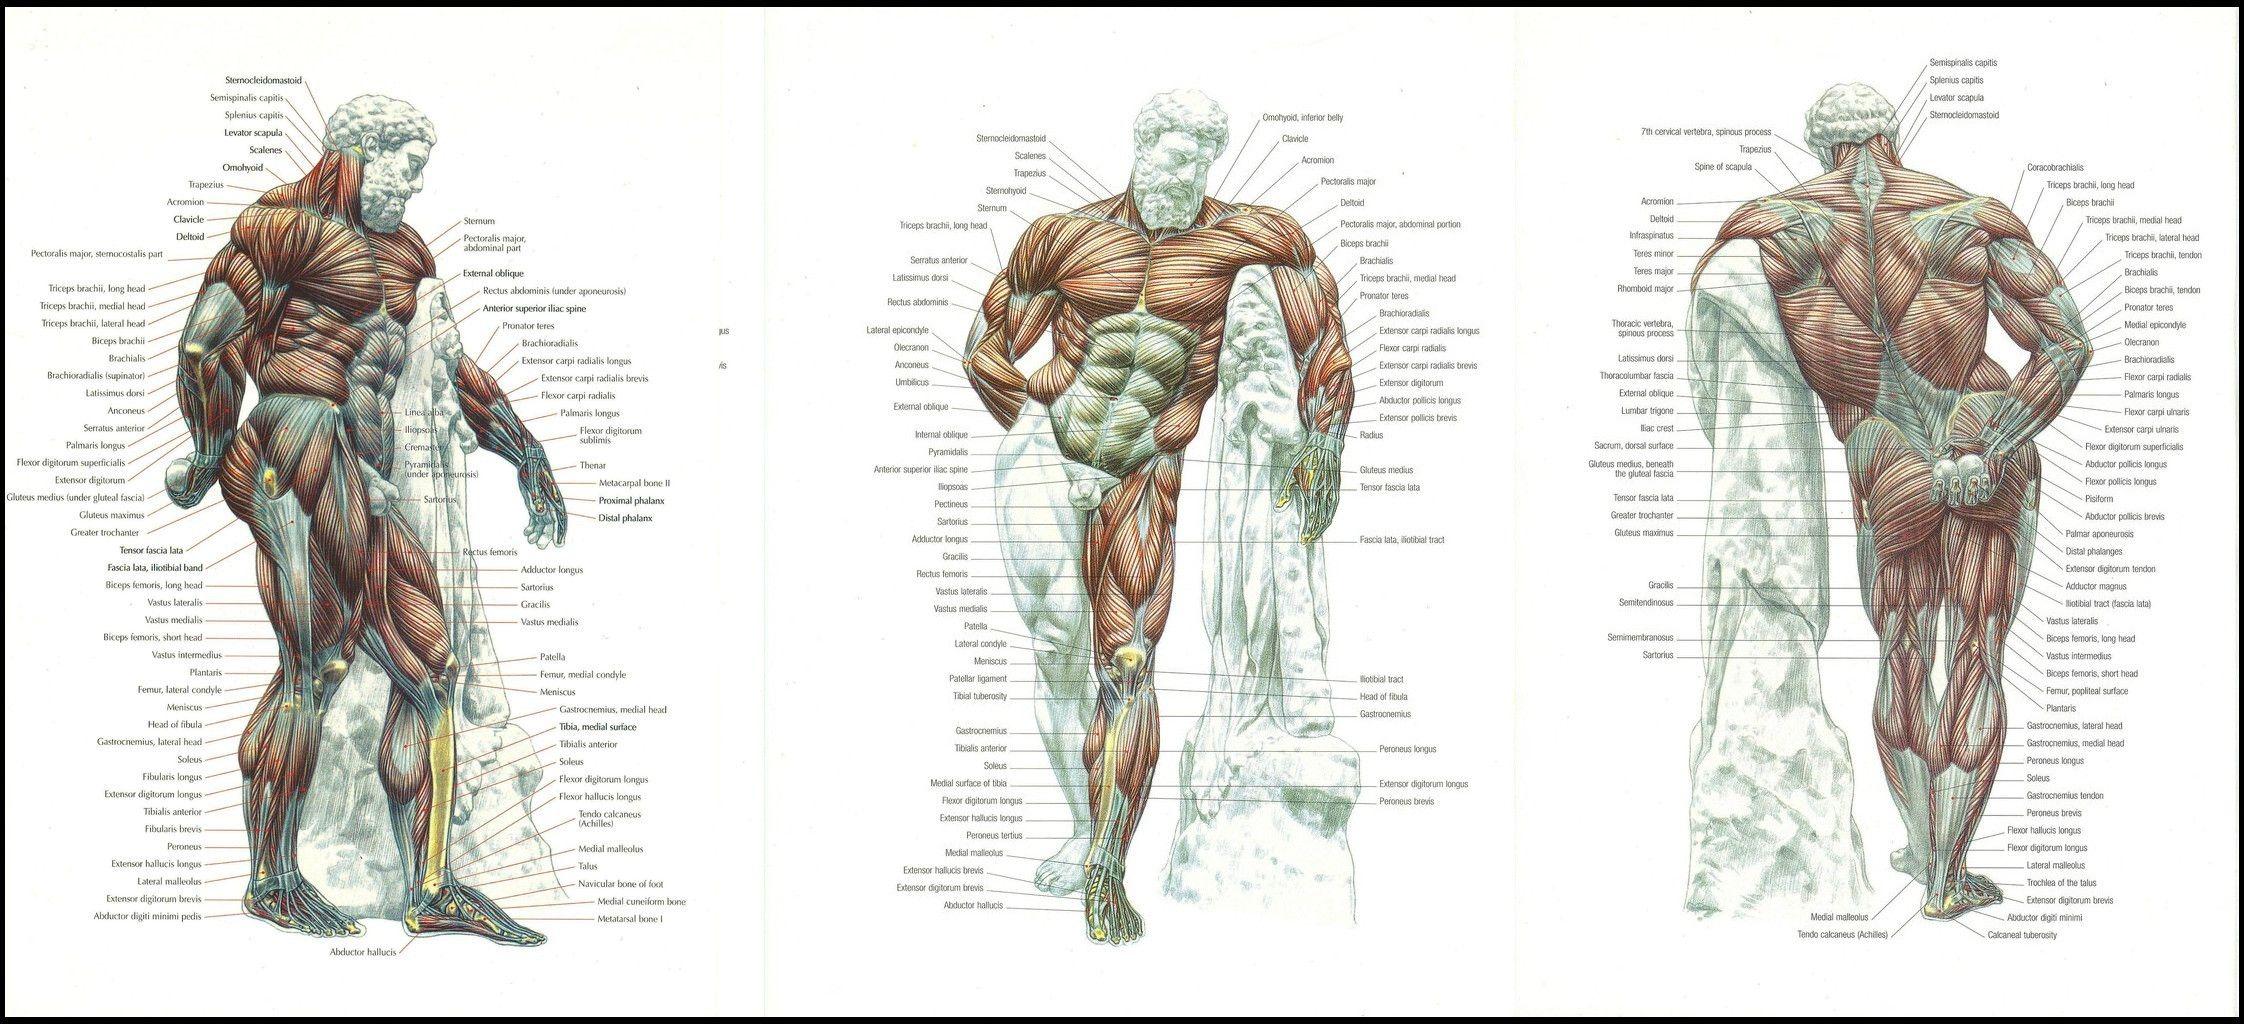 farnese hercules anatomy - Google Search | Fitness | Pinterest